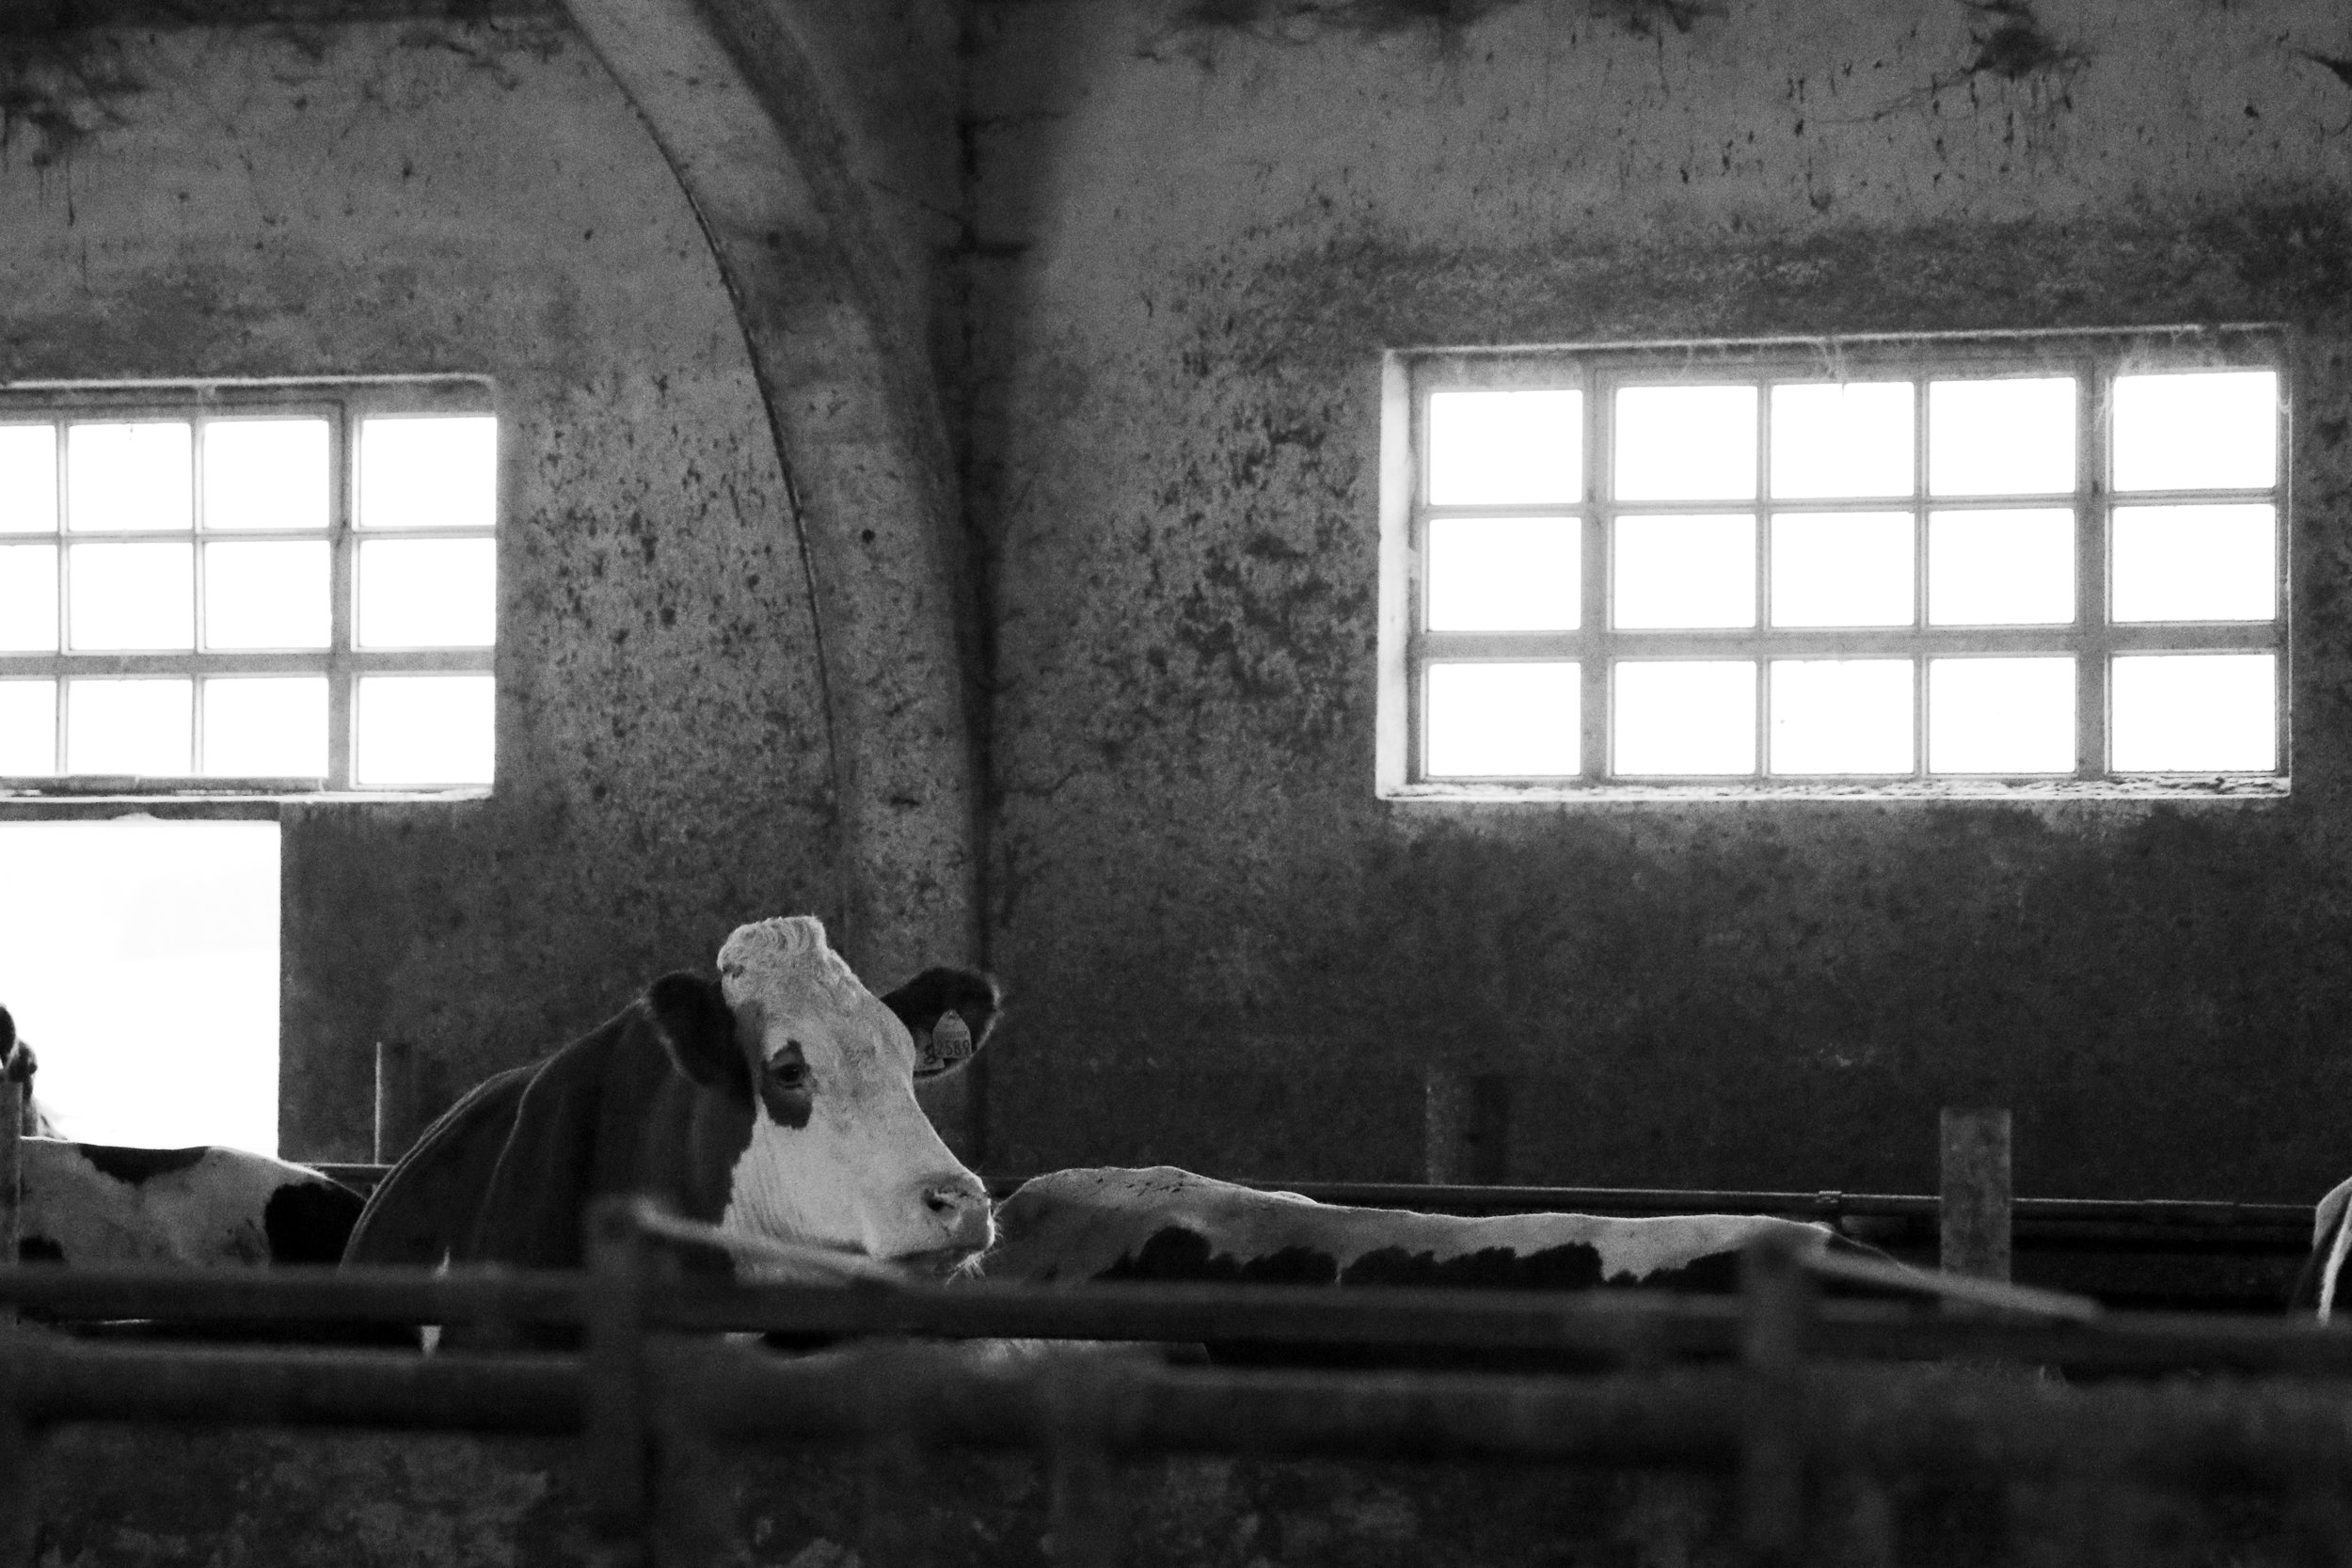 trips-2017-italy-atalanta-veneto-asiago-waister-farm-traditional-farmstead-cheese-maker-raw-milk-280A4153.jpg